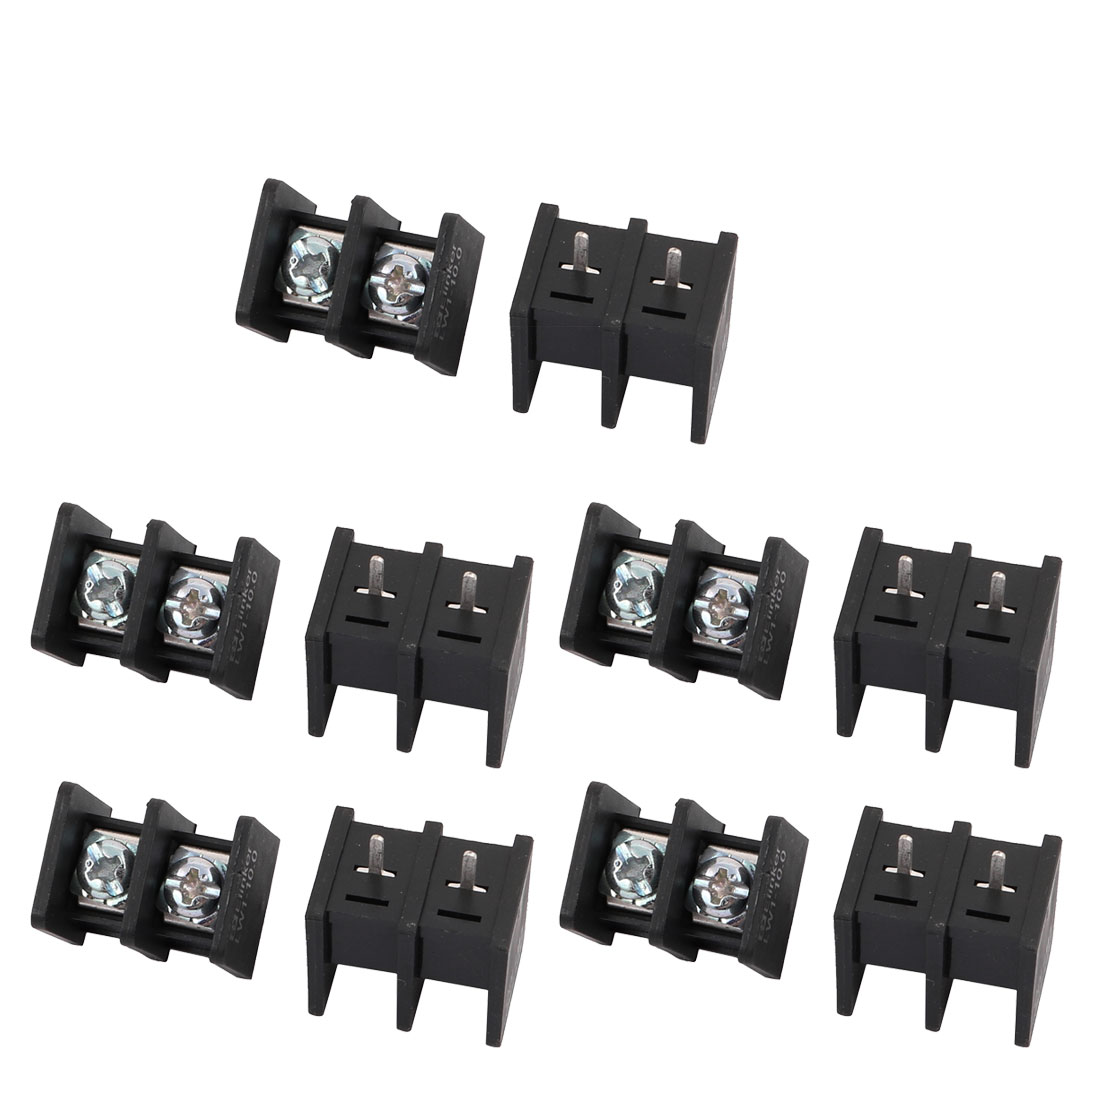 10Pcs LW1C AC300V 20A 10mm Pitch 2P Screw Terminal Block Strip Barrier